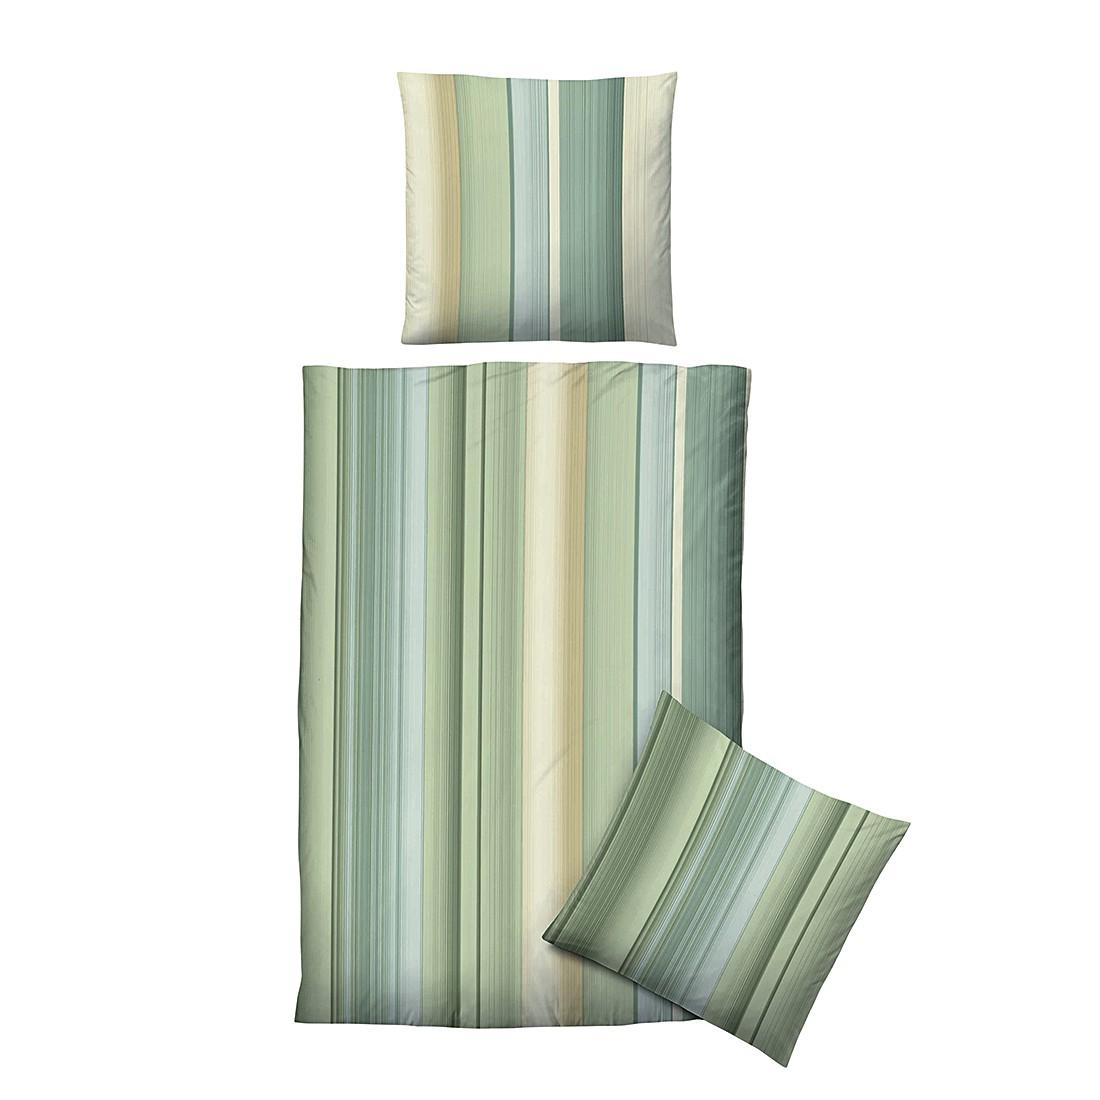 Komfort-Biber-Bettwäsche Susann – Grün – 200 x 200 cm + Kissen 80 x 80 cm, Biberna günstig online kaufen